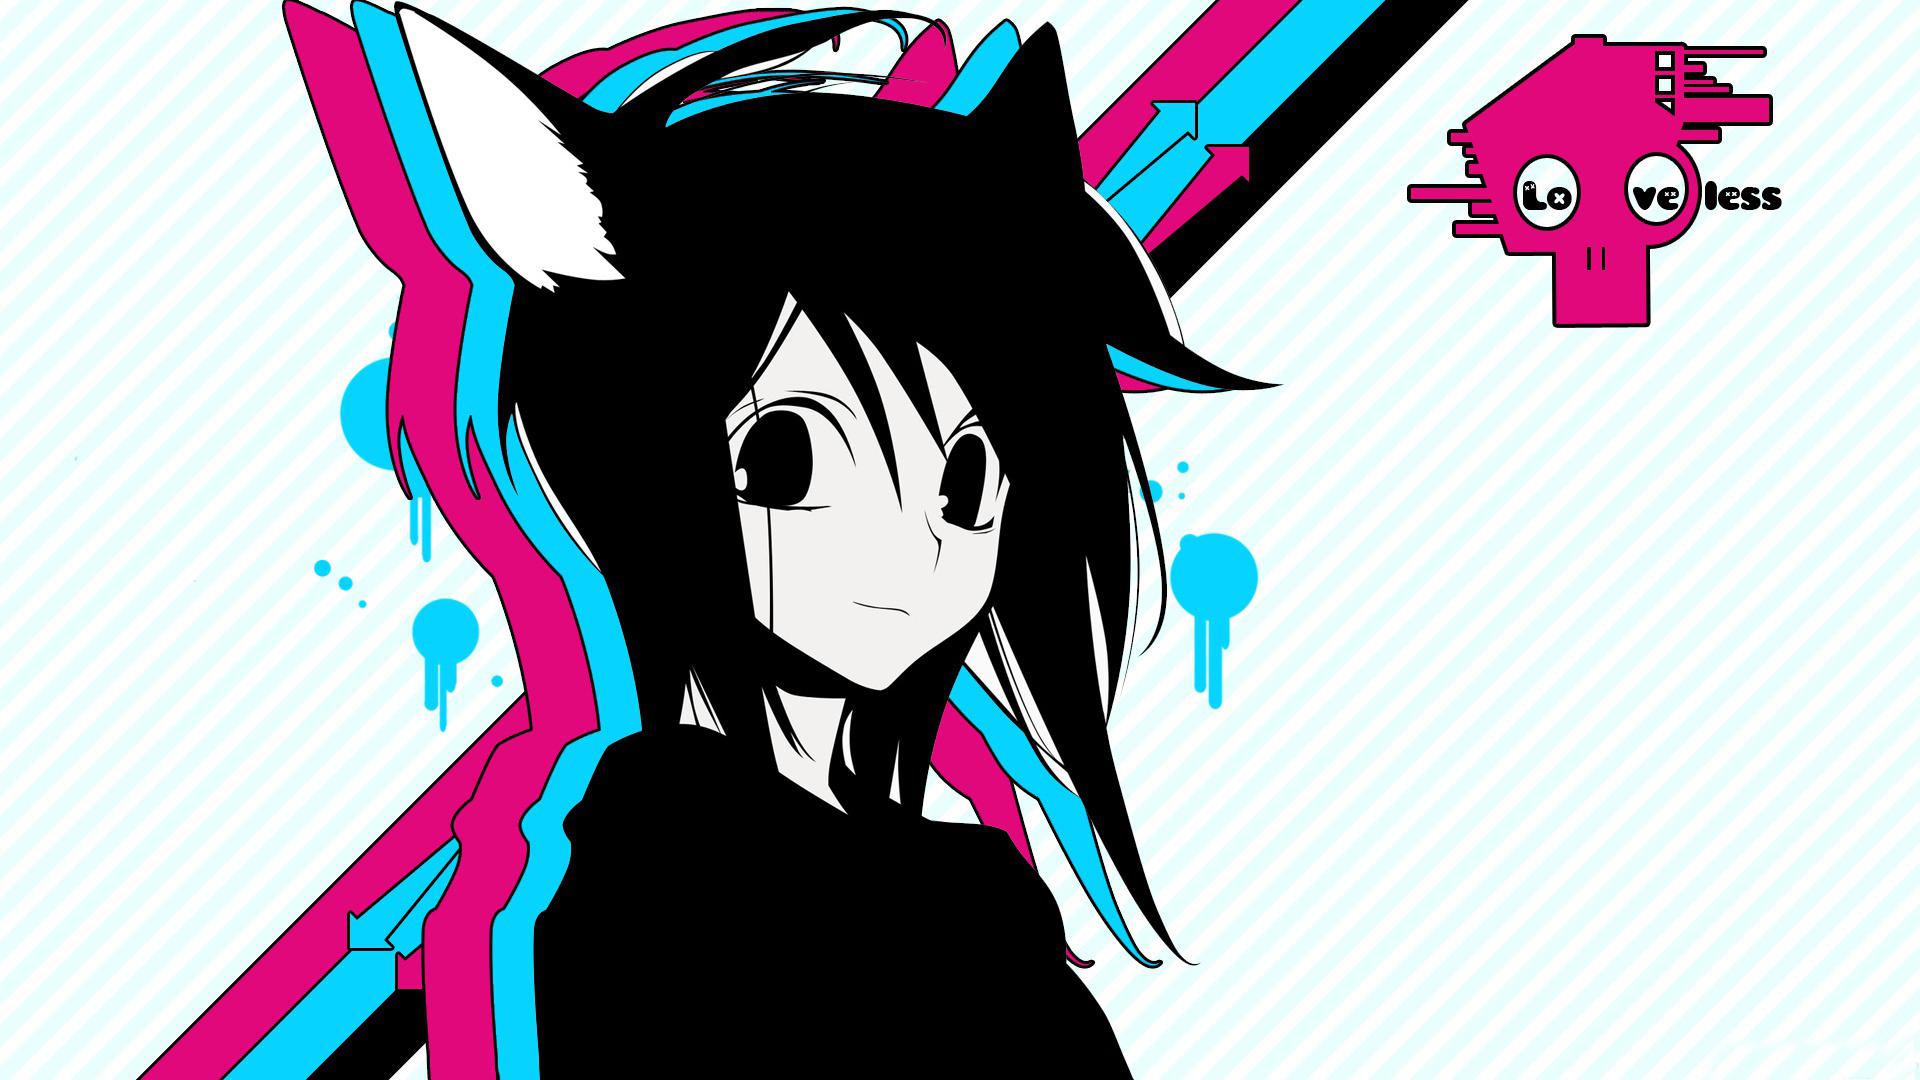 Sad Love Anime 37 Hd Wallpaper   Hdlovewallcom 1920x1080